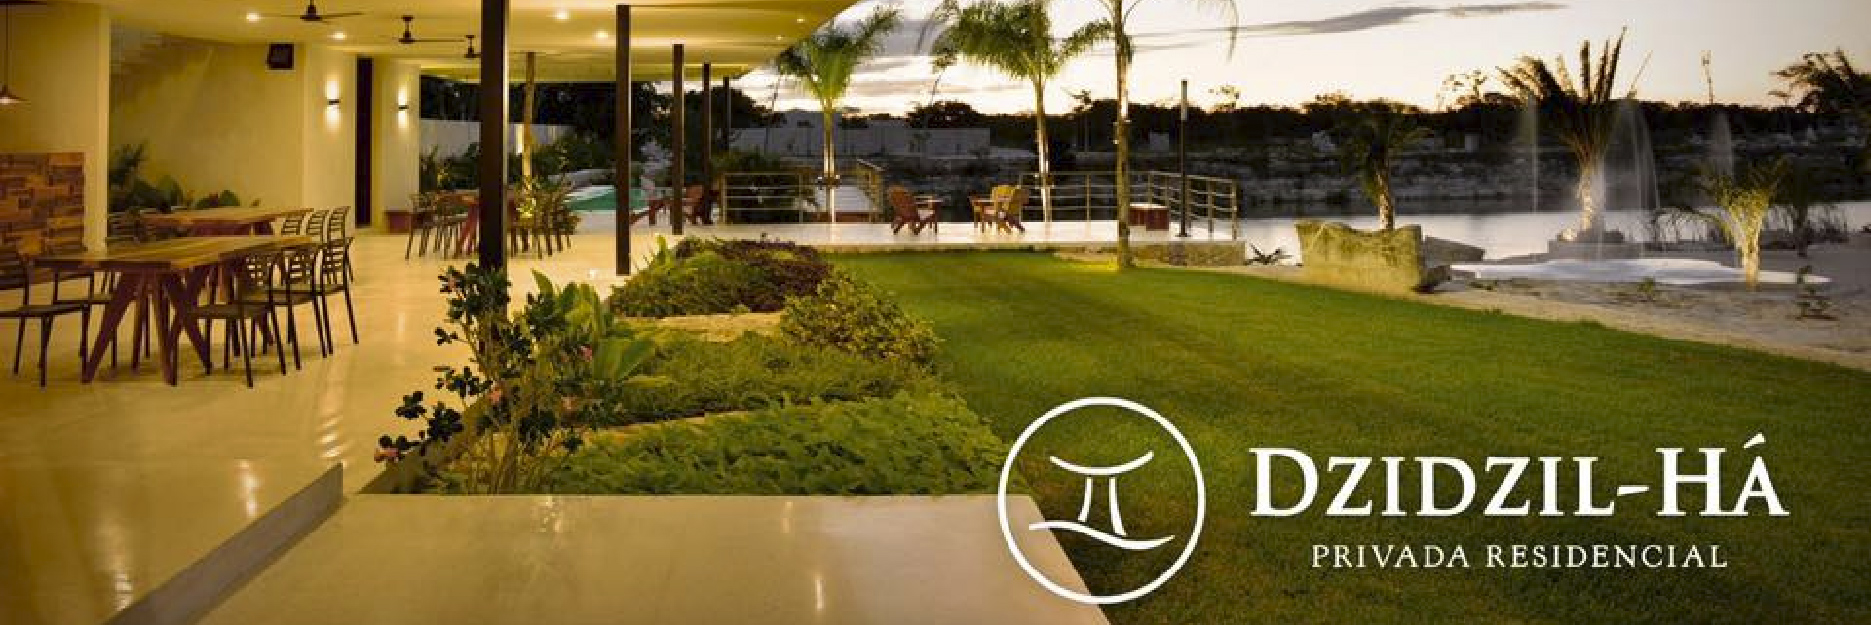 Terrenos Residenciales Venta Mérida DZIDZIL-HÁ Goodlers